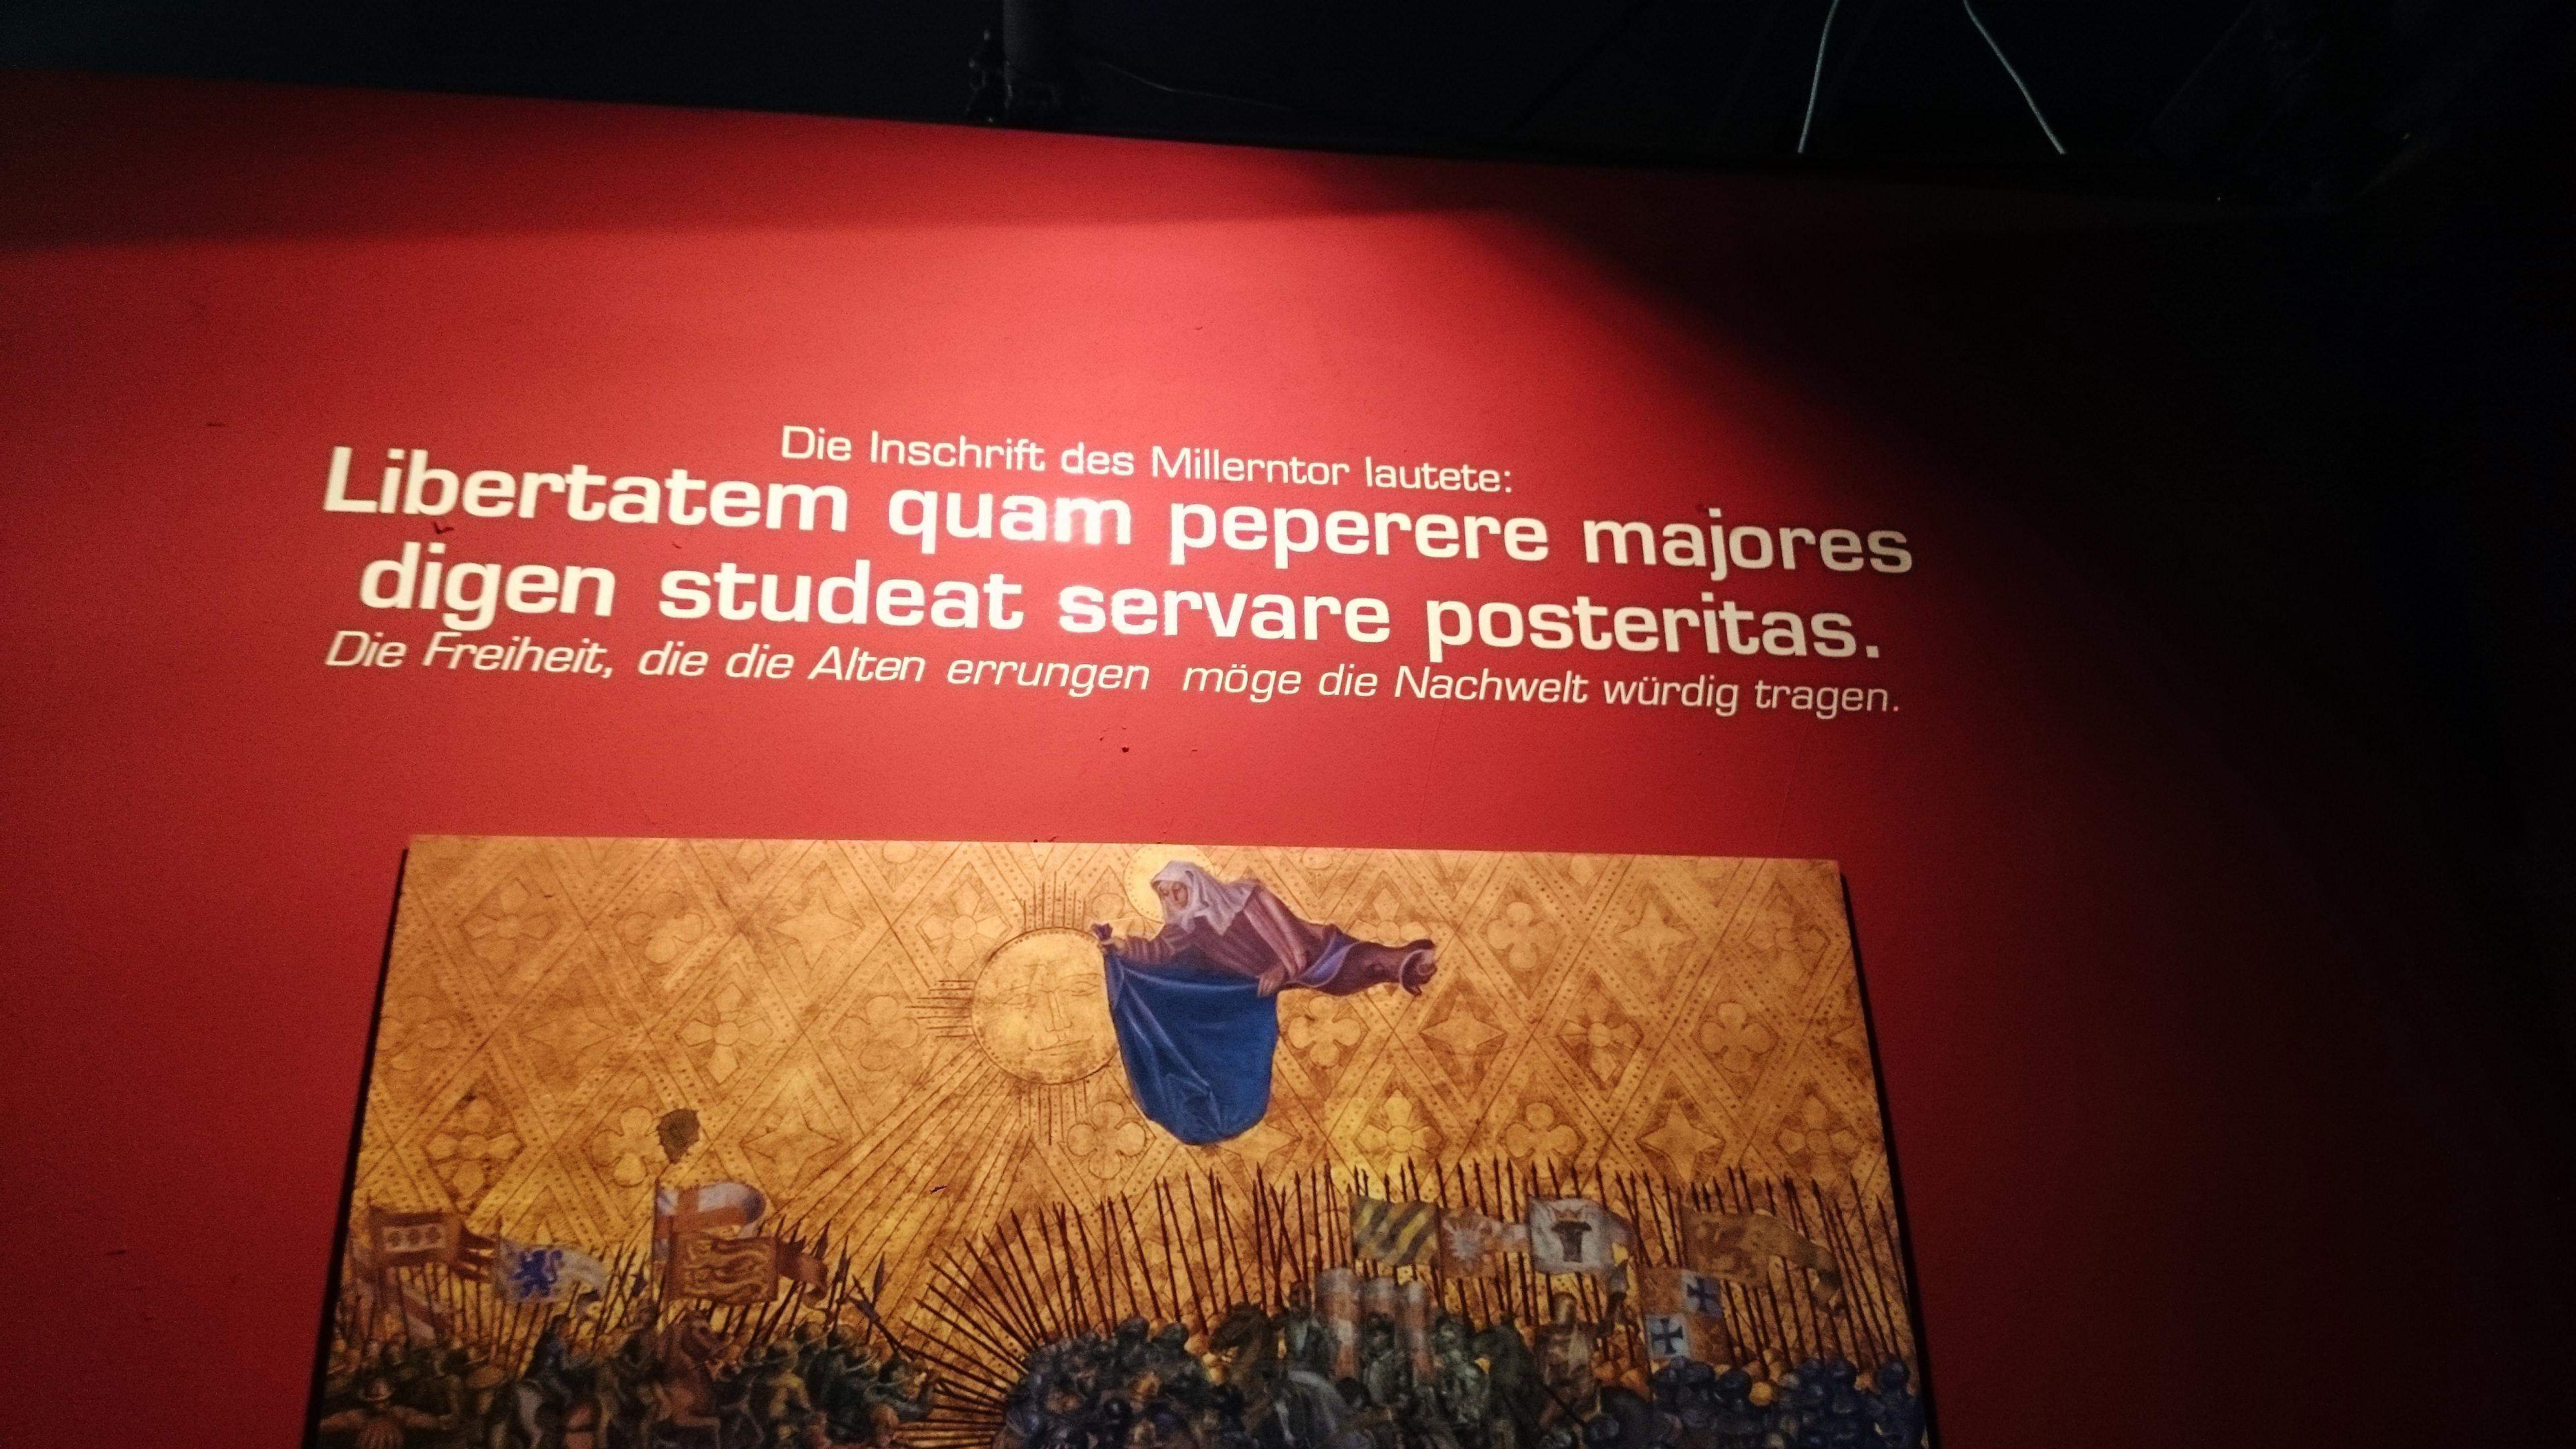 viagemhamburgo_sanktpauli_museum